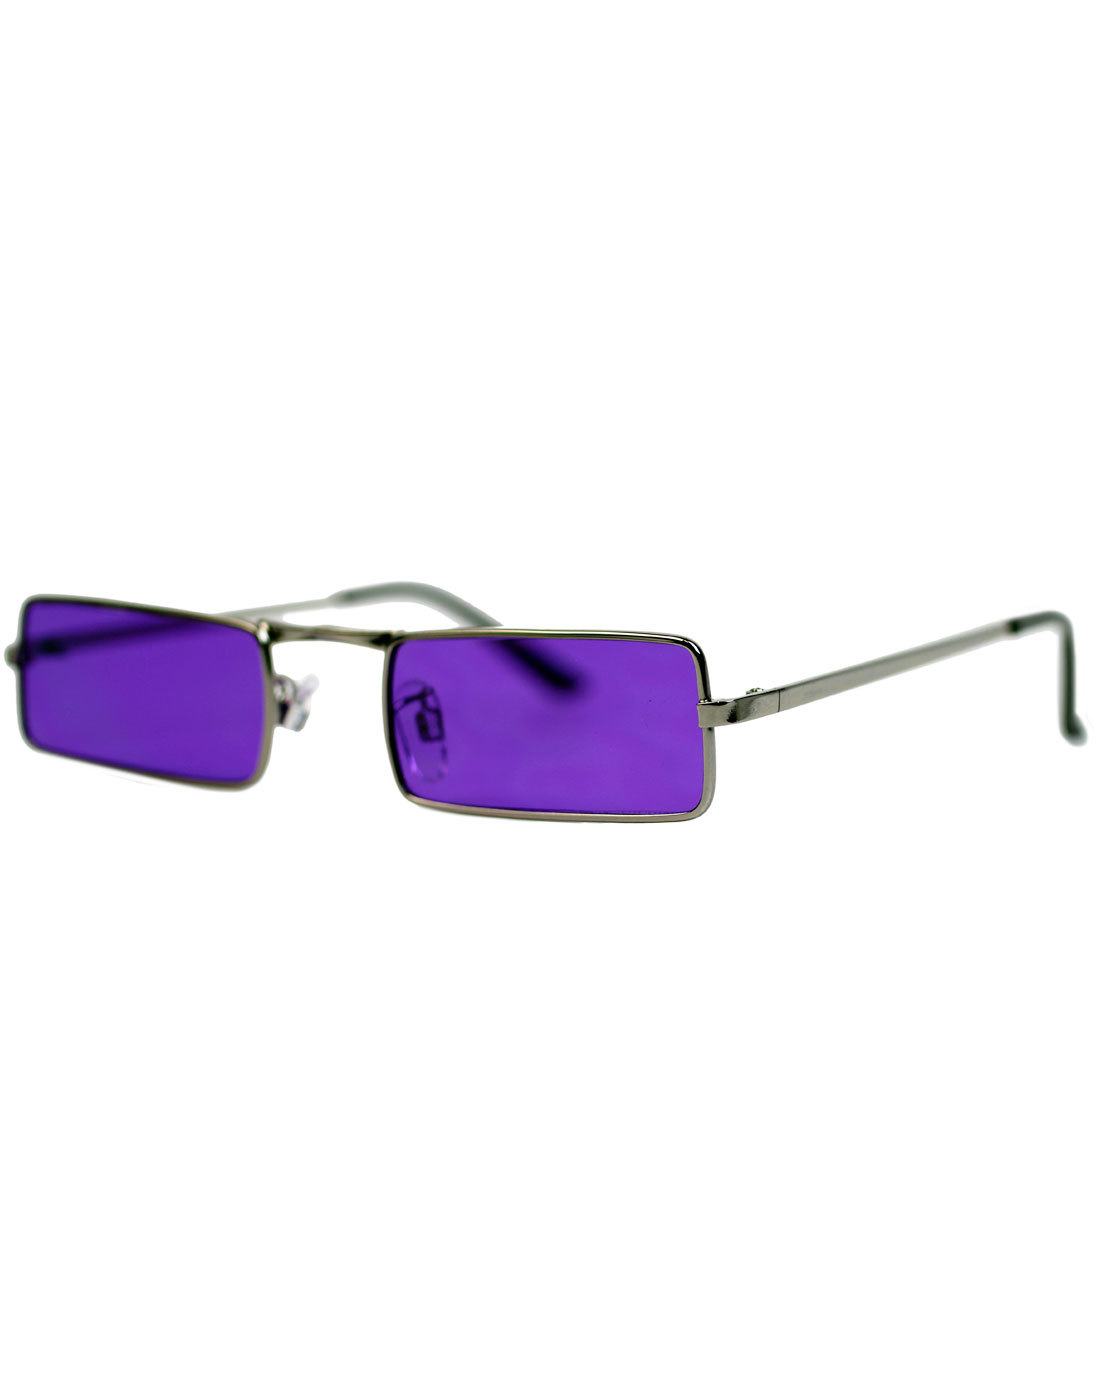 505d3b0e10 MADCAP ENGLAND McGuinn 60s Mod Psychedelic Granny Glasses Purple